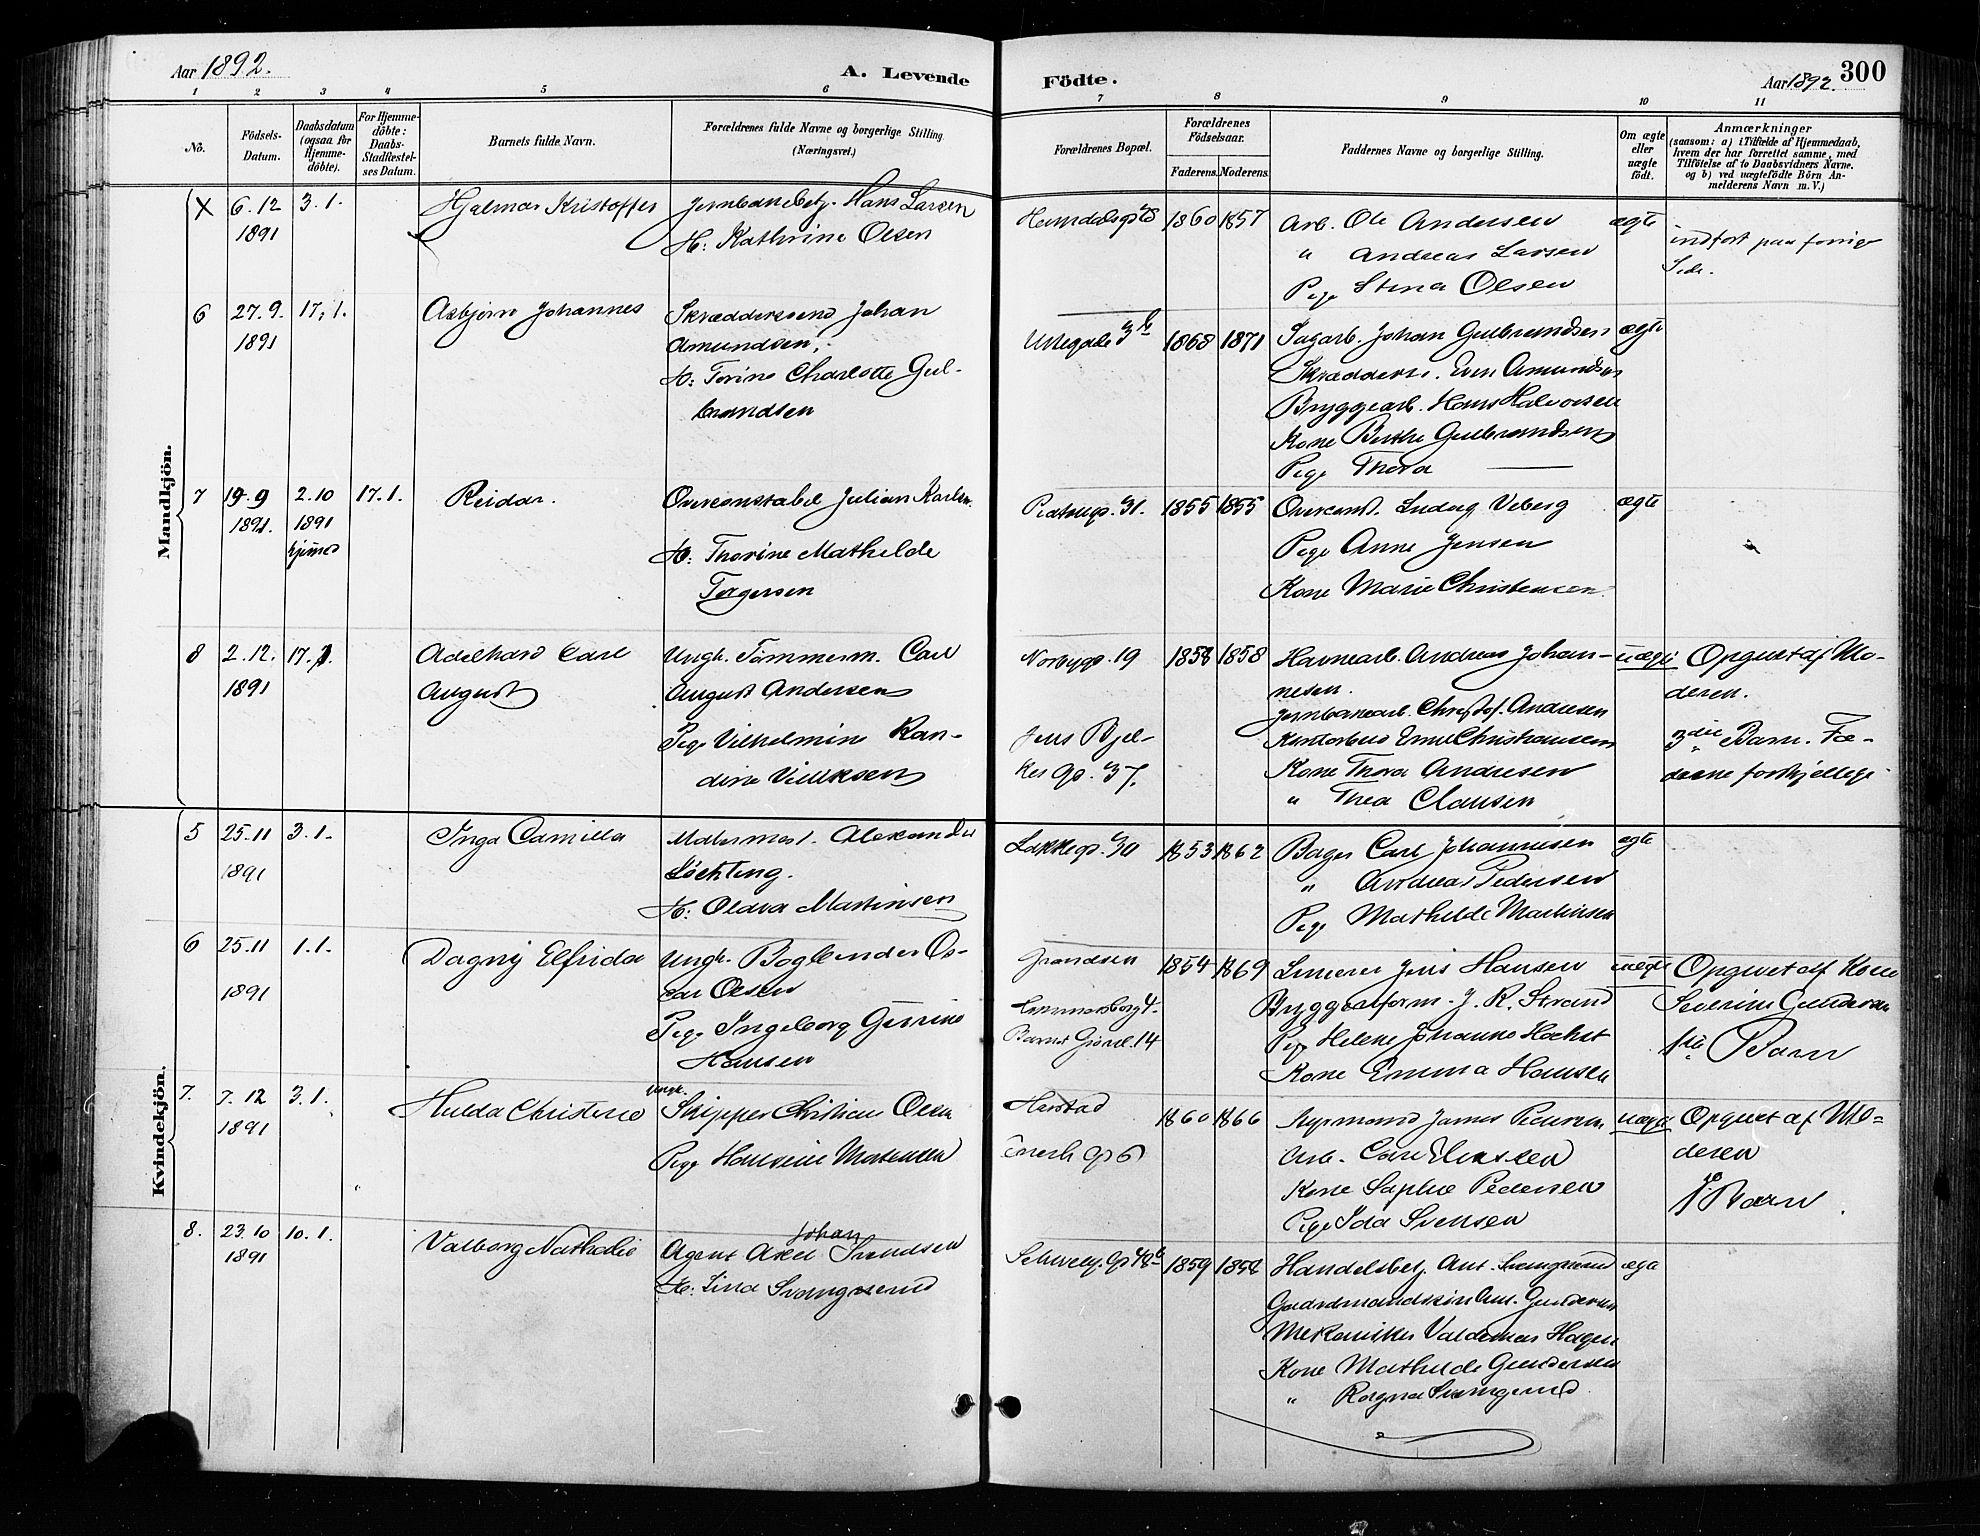 SAO, Grønland prestekontor Kirkebøker, F/Fa/L0009: Parish register (official) no. 9, 1888-1893, p. 300